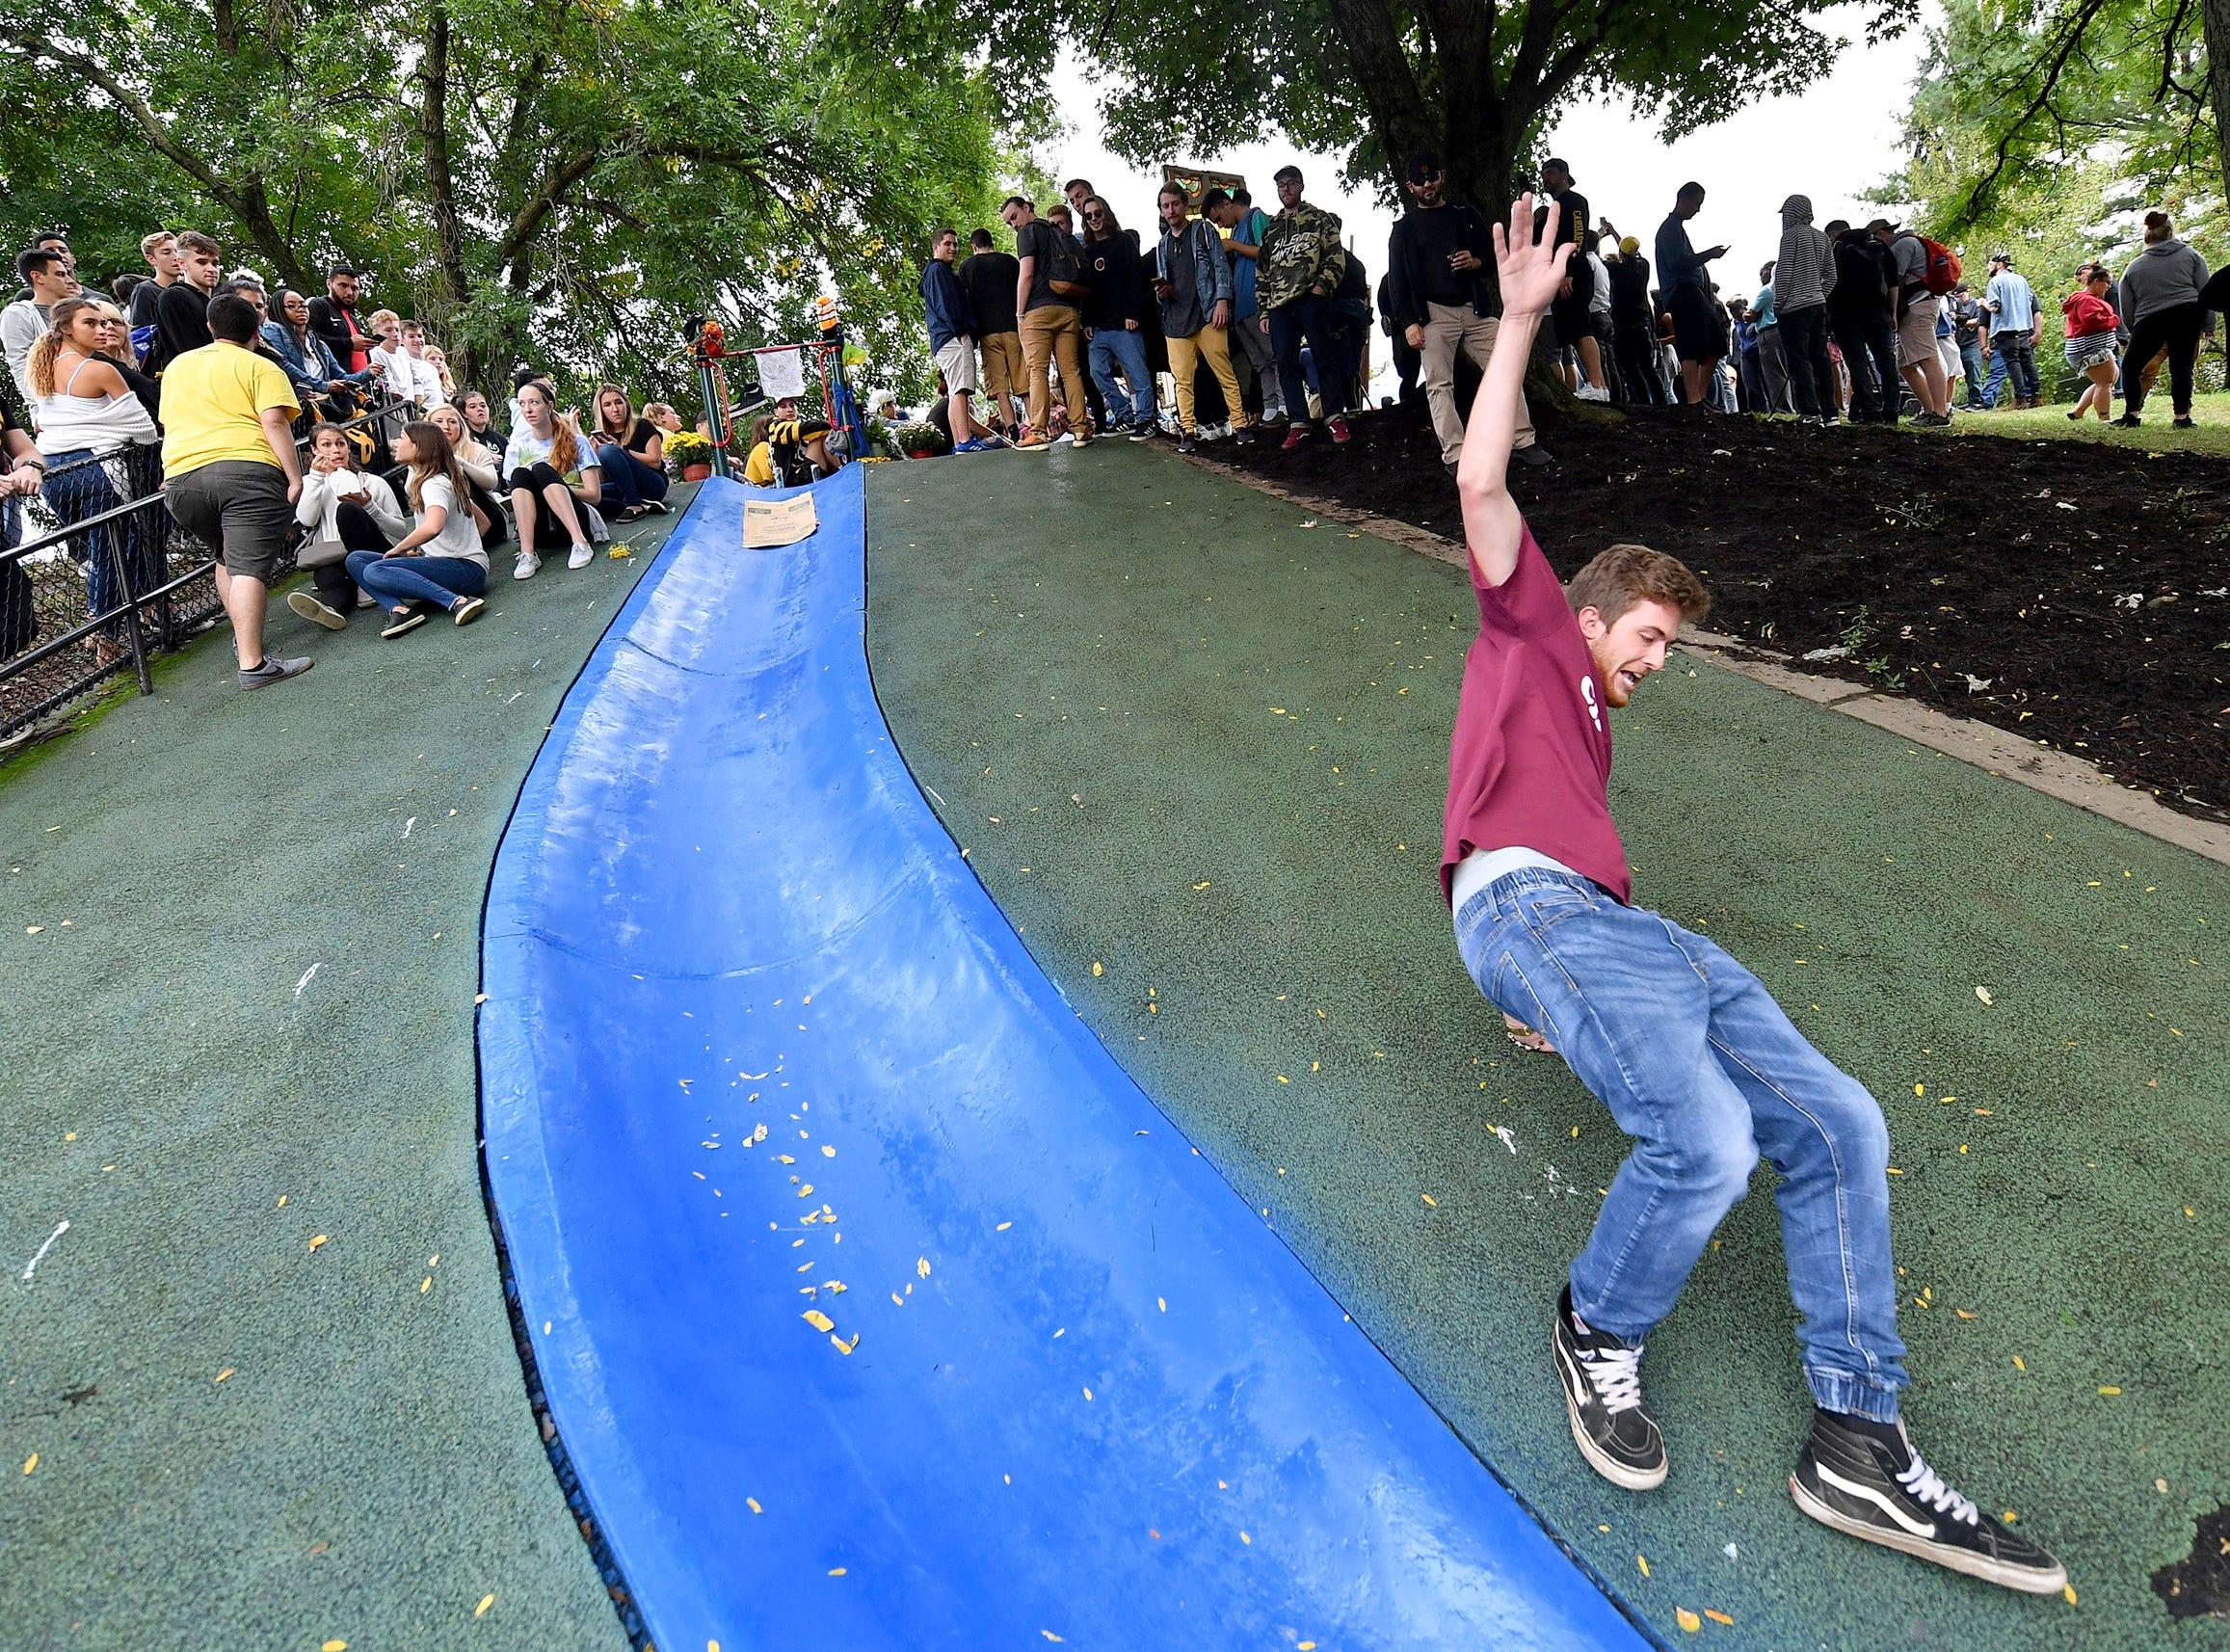 Brandon Porterfield, 21, of Mt. Pleasant, Pa. takes a slide during a vigil for rapper Mac Miller Tuesday, Sept. 11, 2018 at Blue Slide Park in Pittsburgh. Miller's debut studio album was named Blue Slide Park. (Matt Freed/Post-Gazette via AP) ORG XMIT: PAPIT103